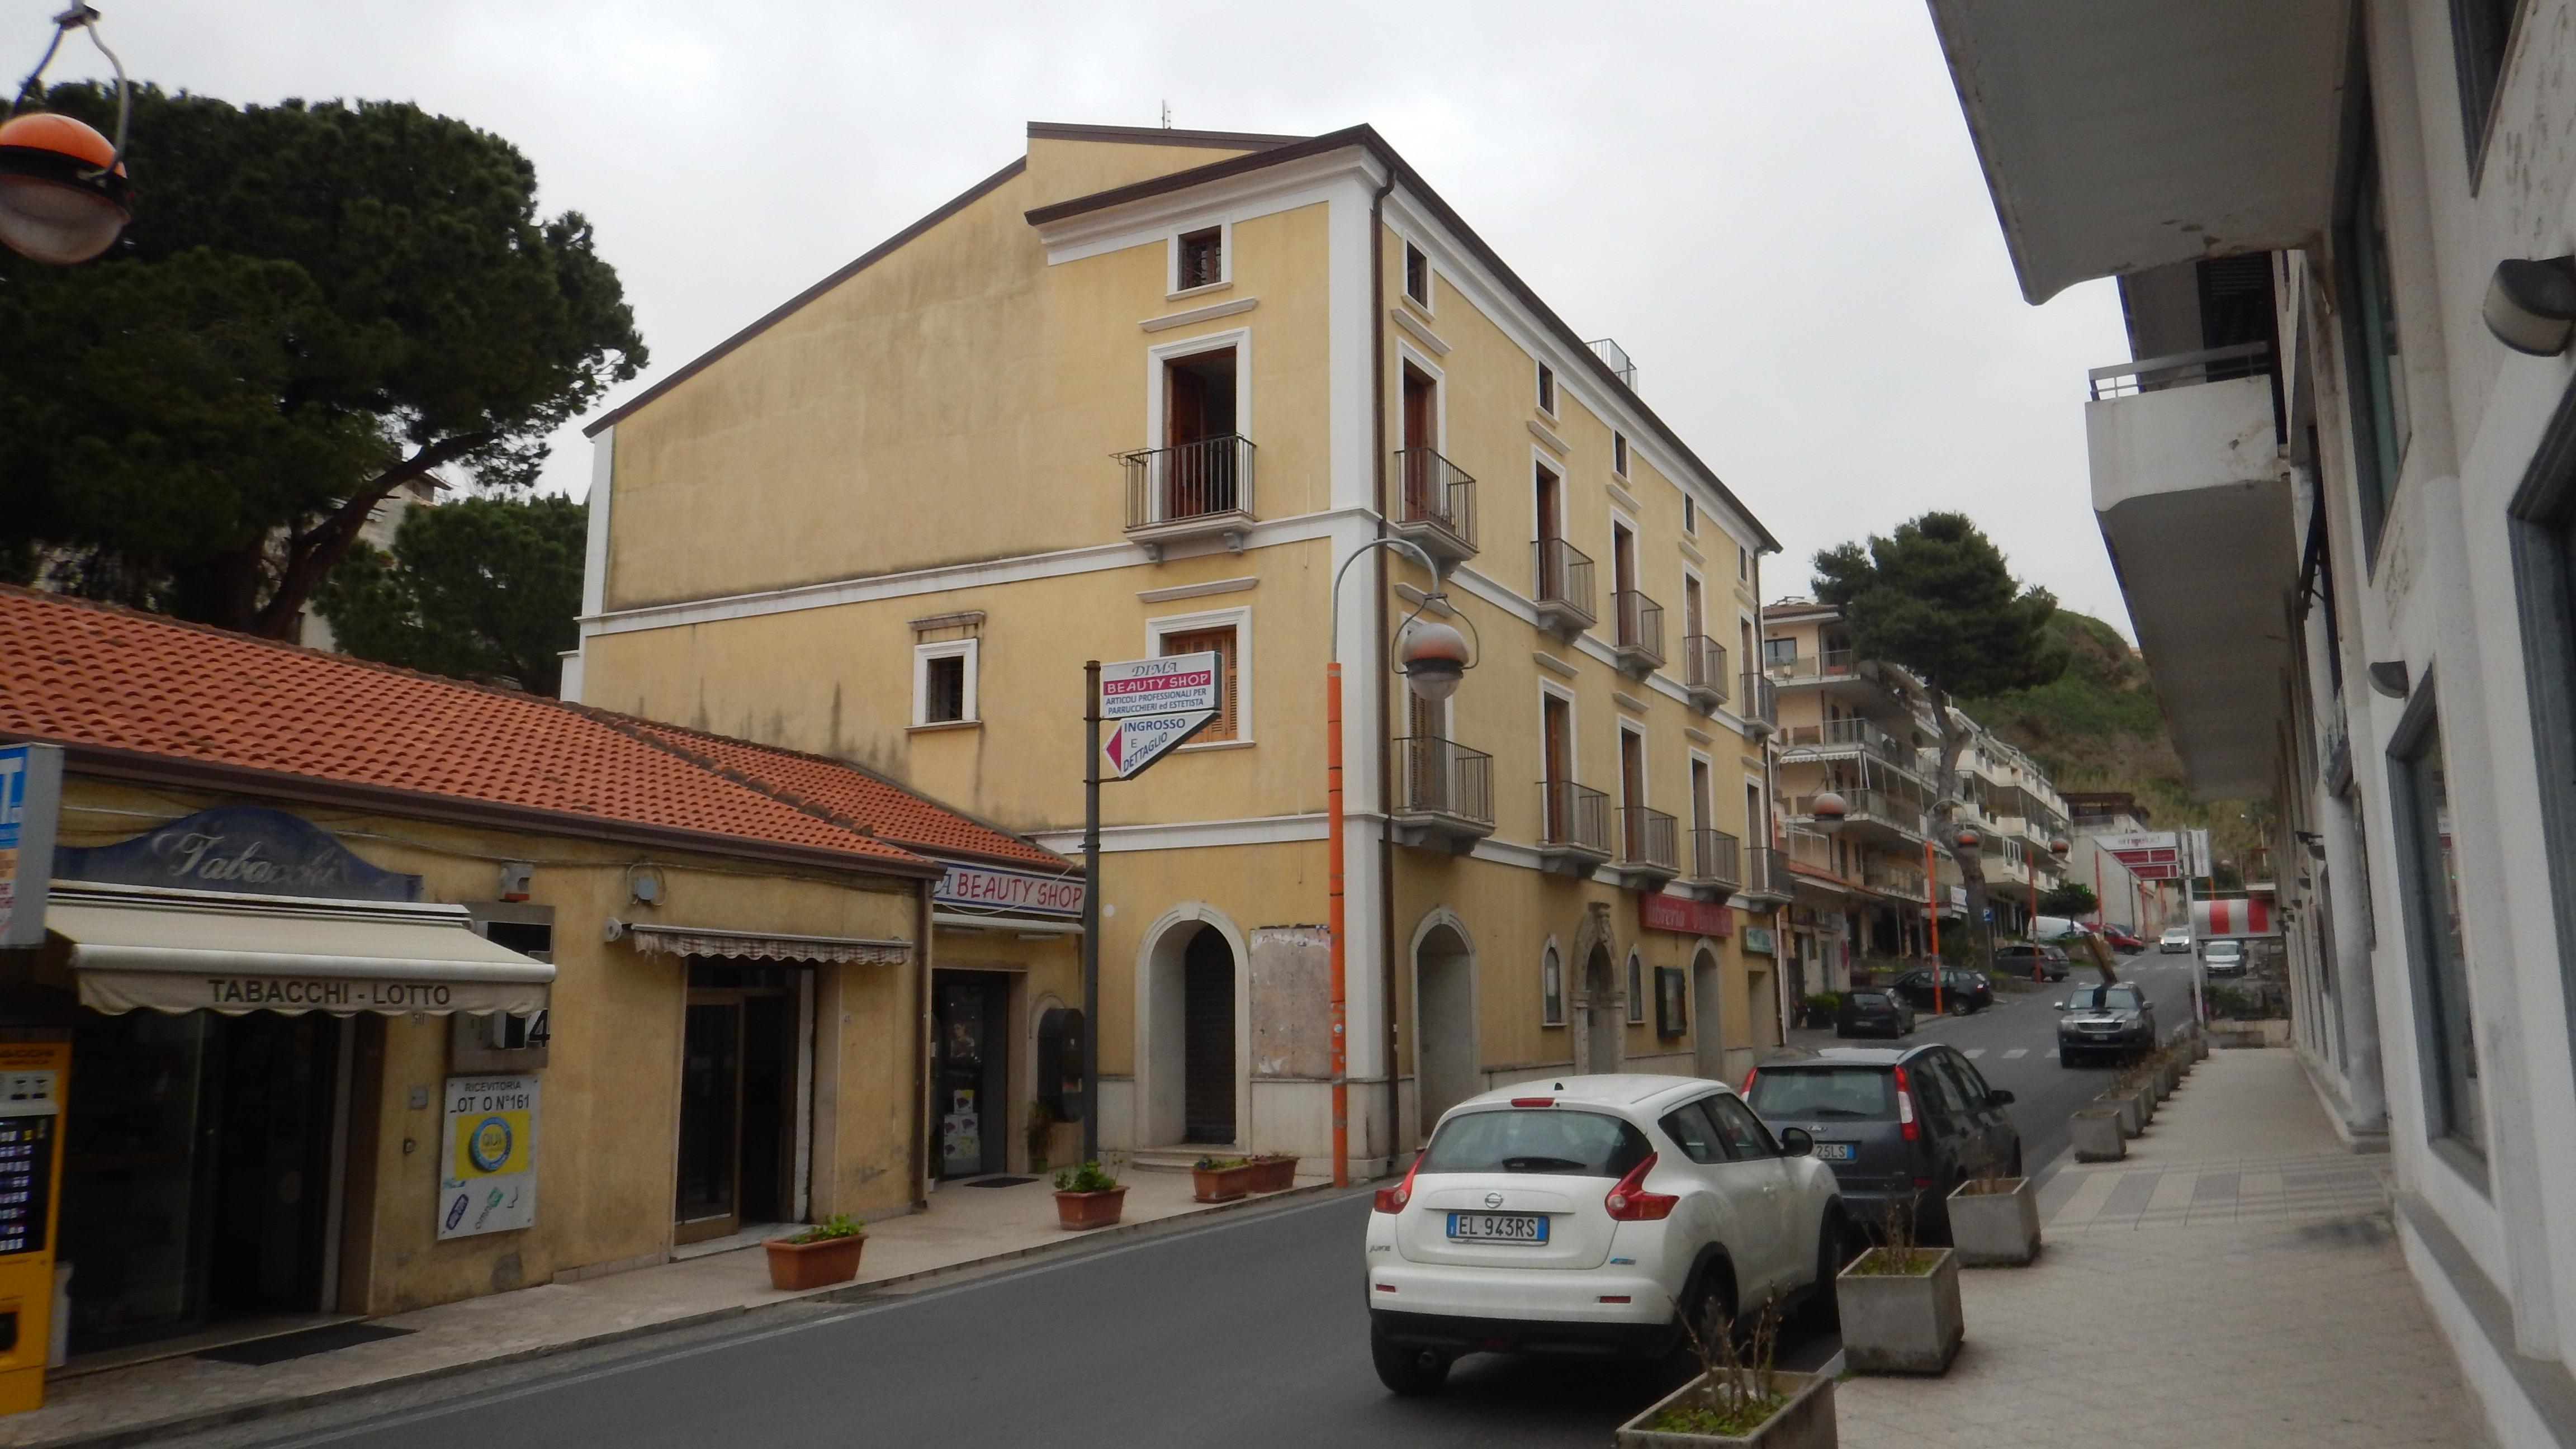 Palazzodifamigliajpg